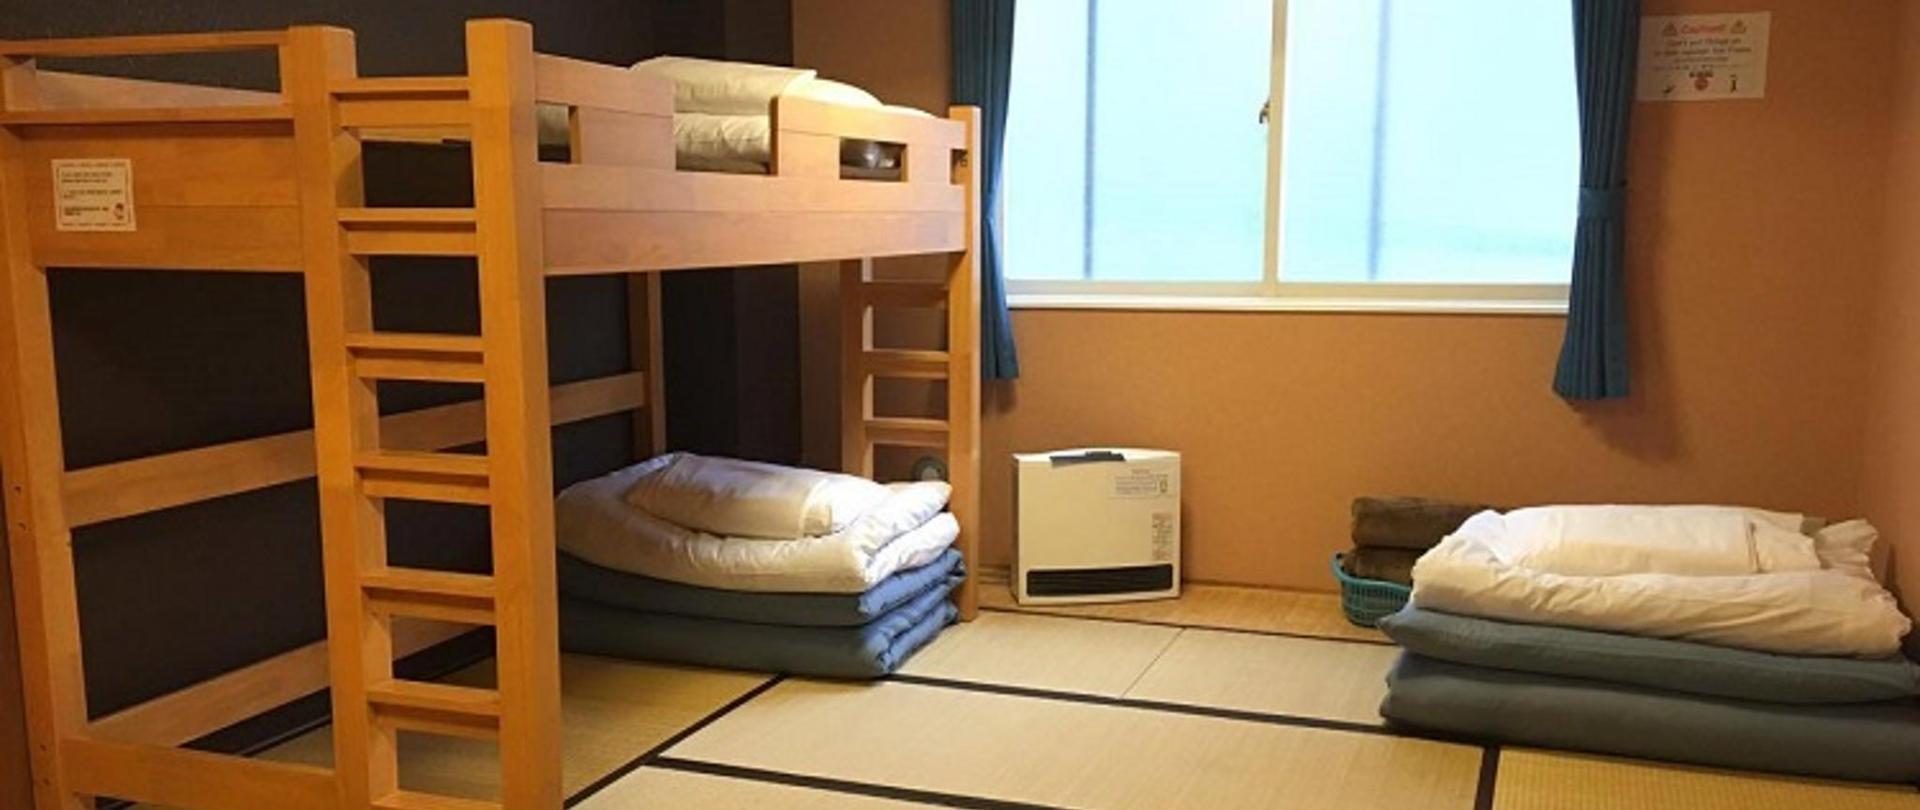 Khaosan Sapporo Perekond Hostel